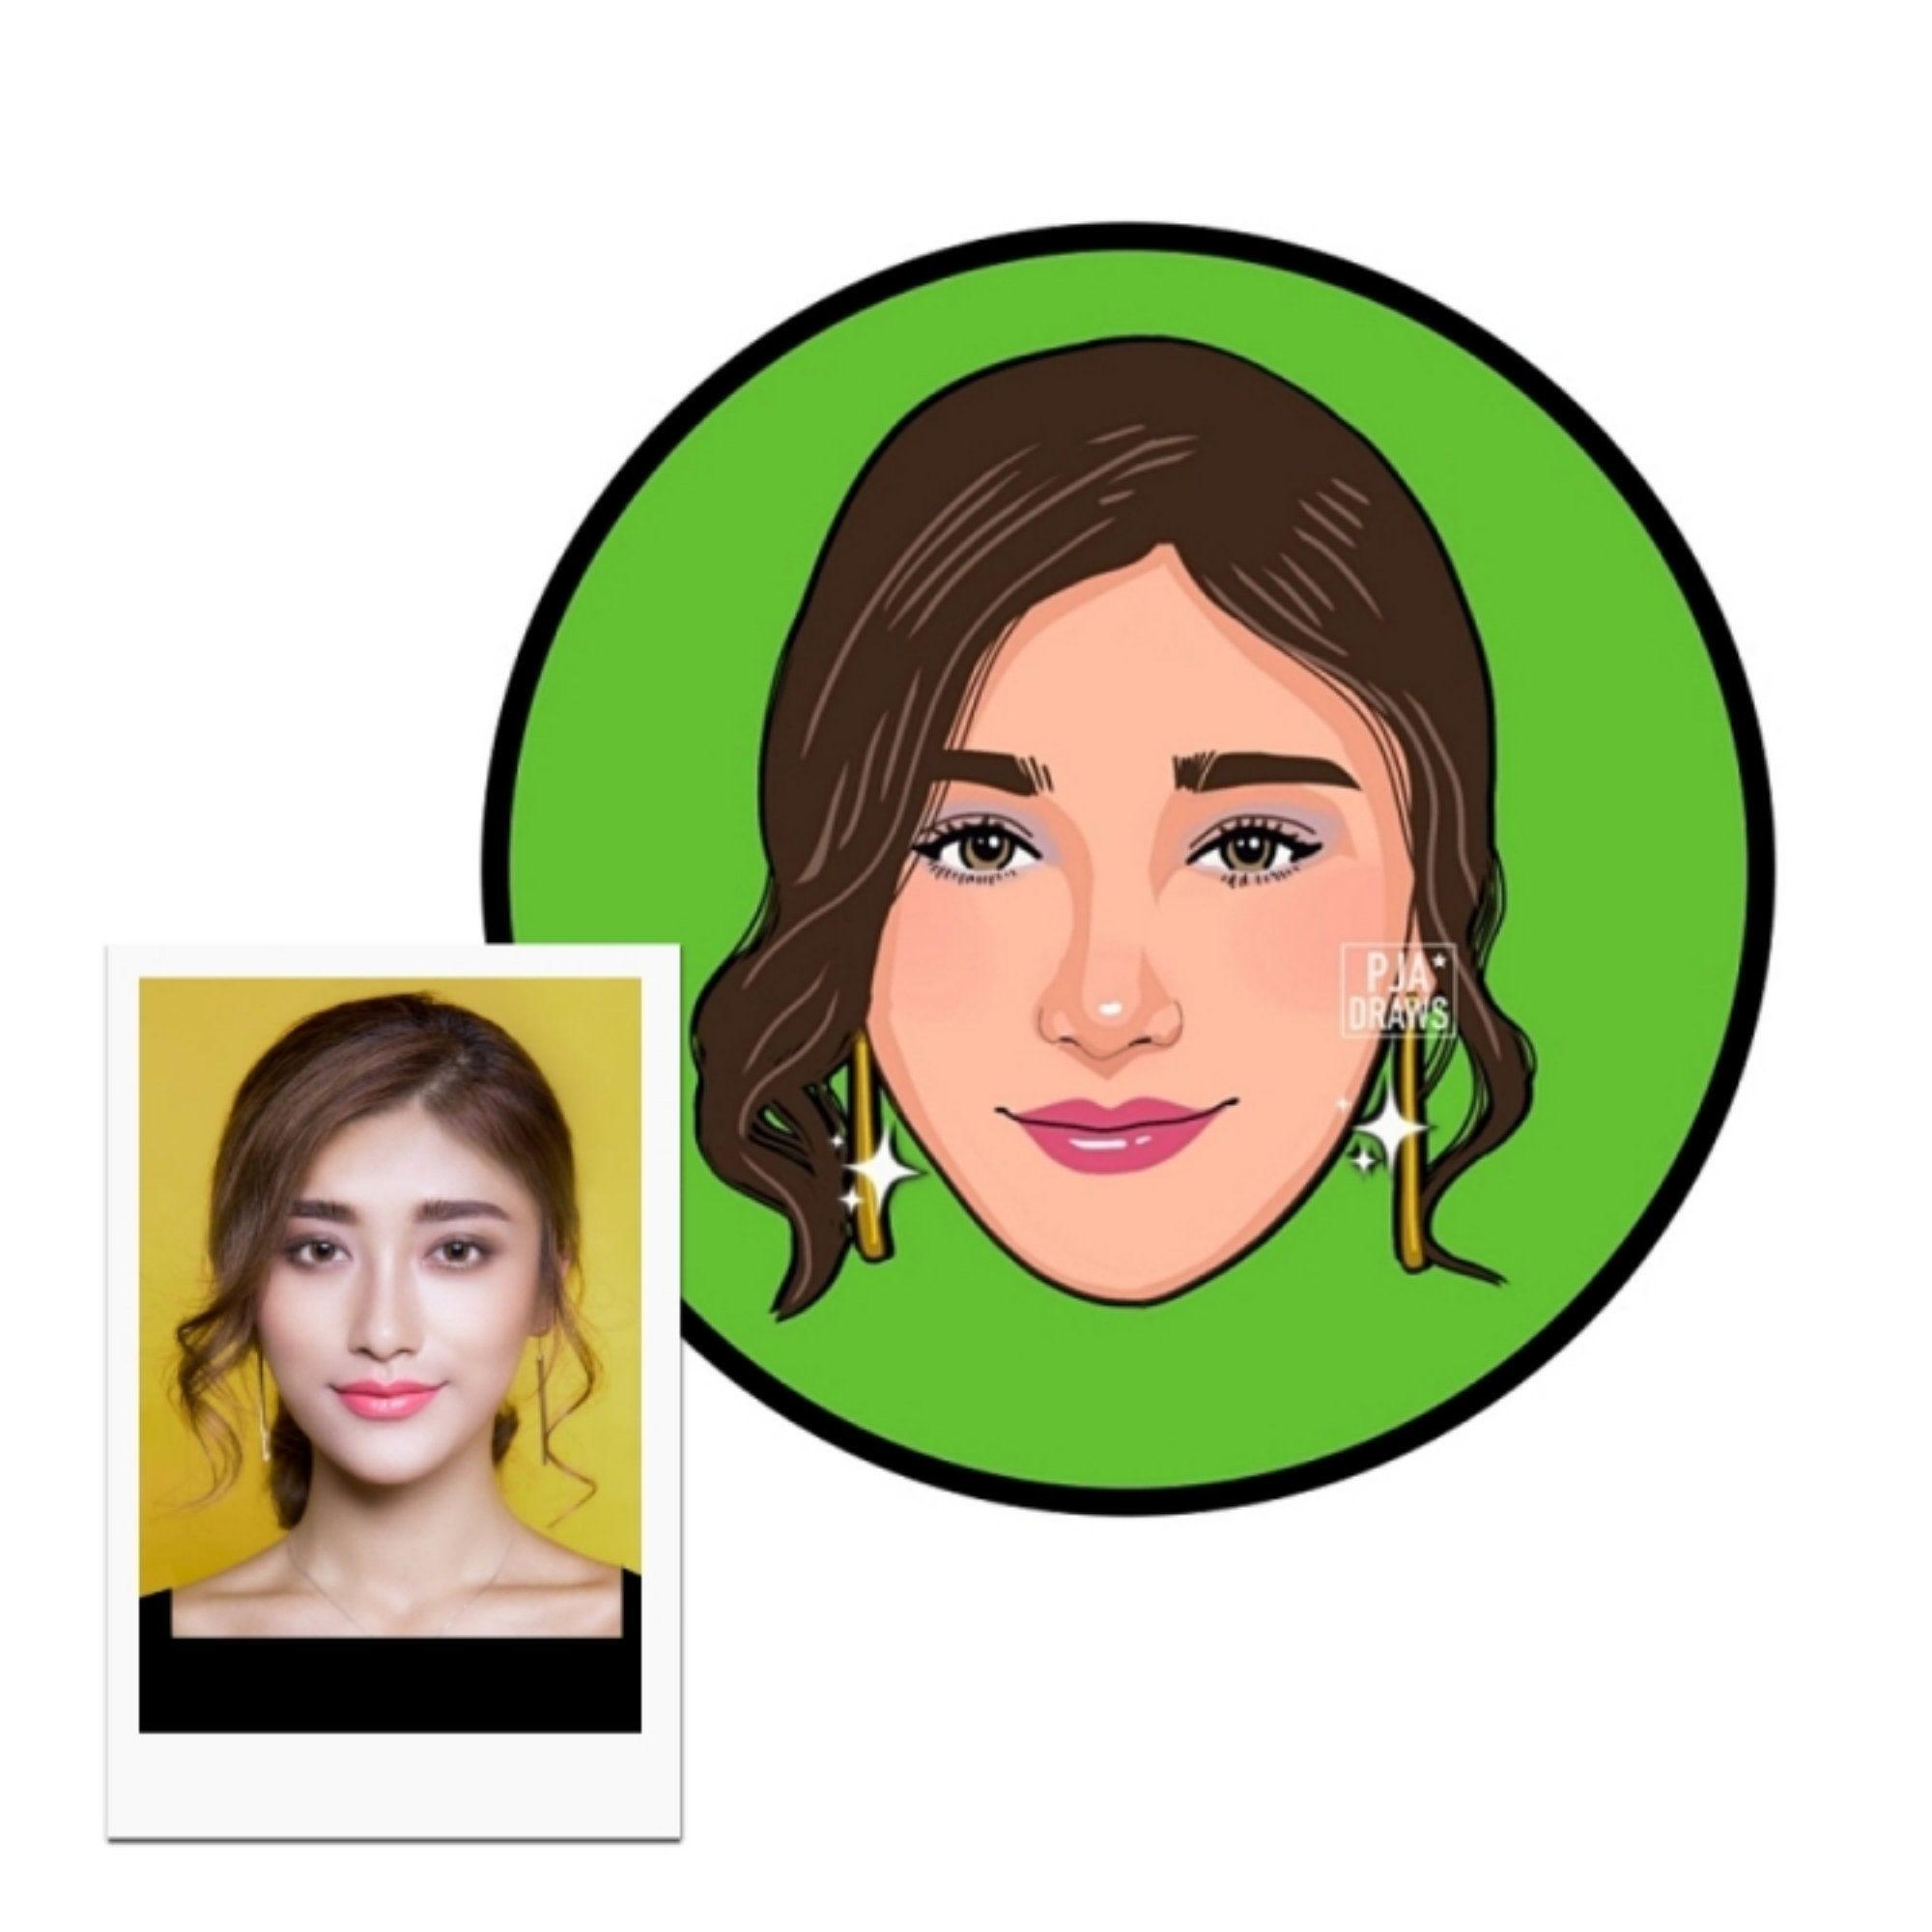 Cartoon Headshot Social Media Logo Cartoon Portrait Etsy In 2020 Portrait Drawing Photo To Cartoon Caricature